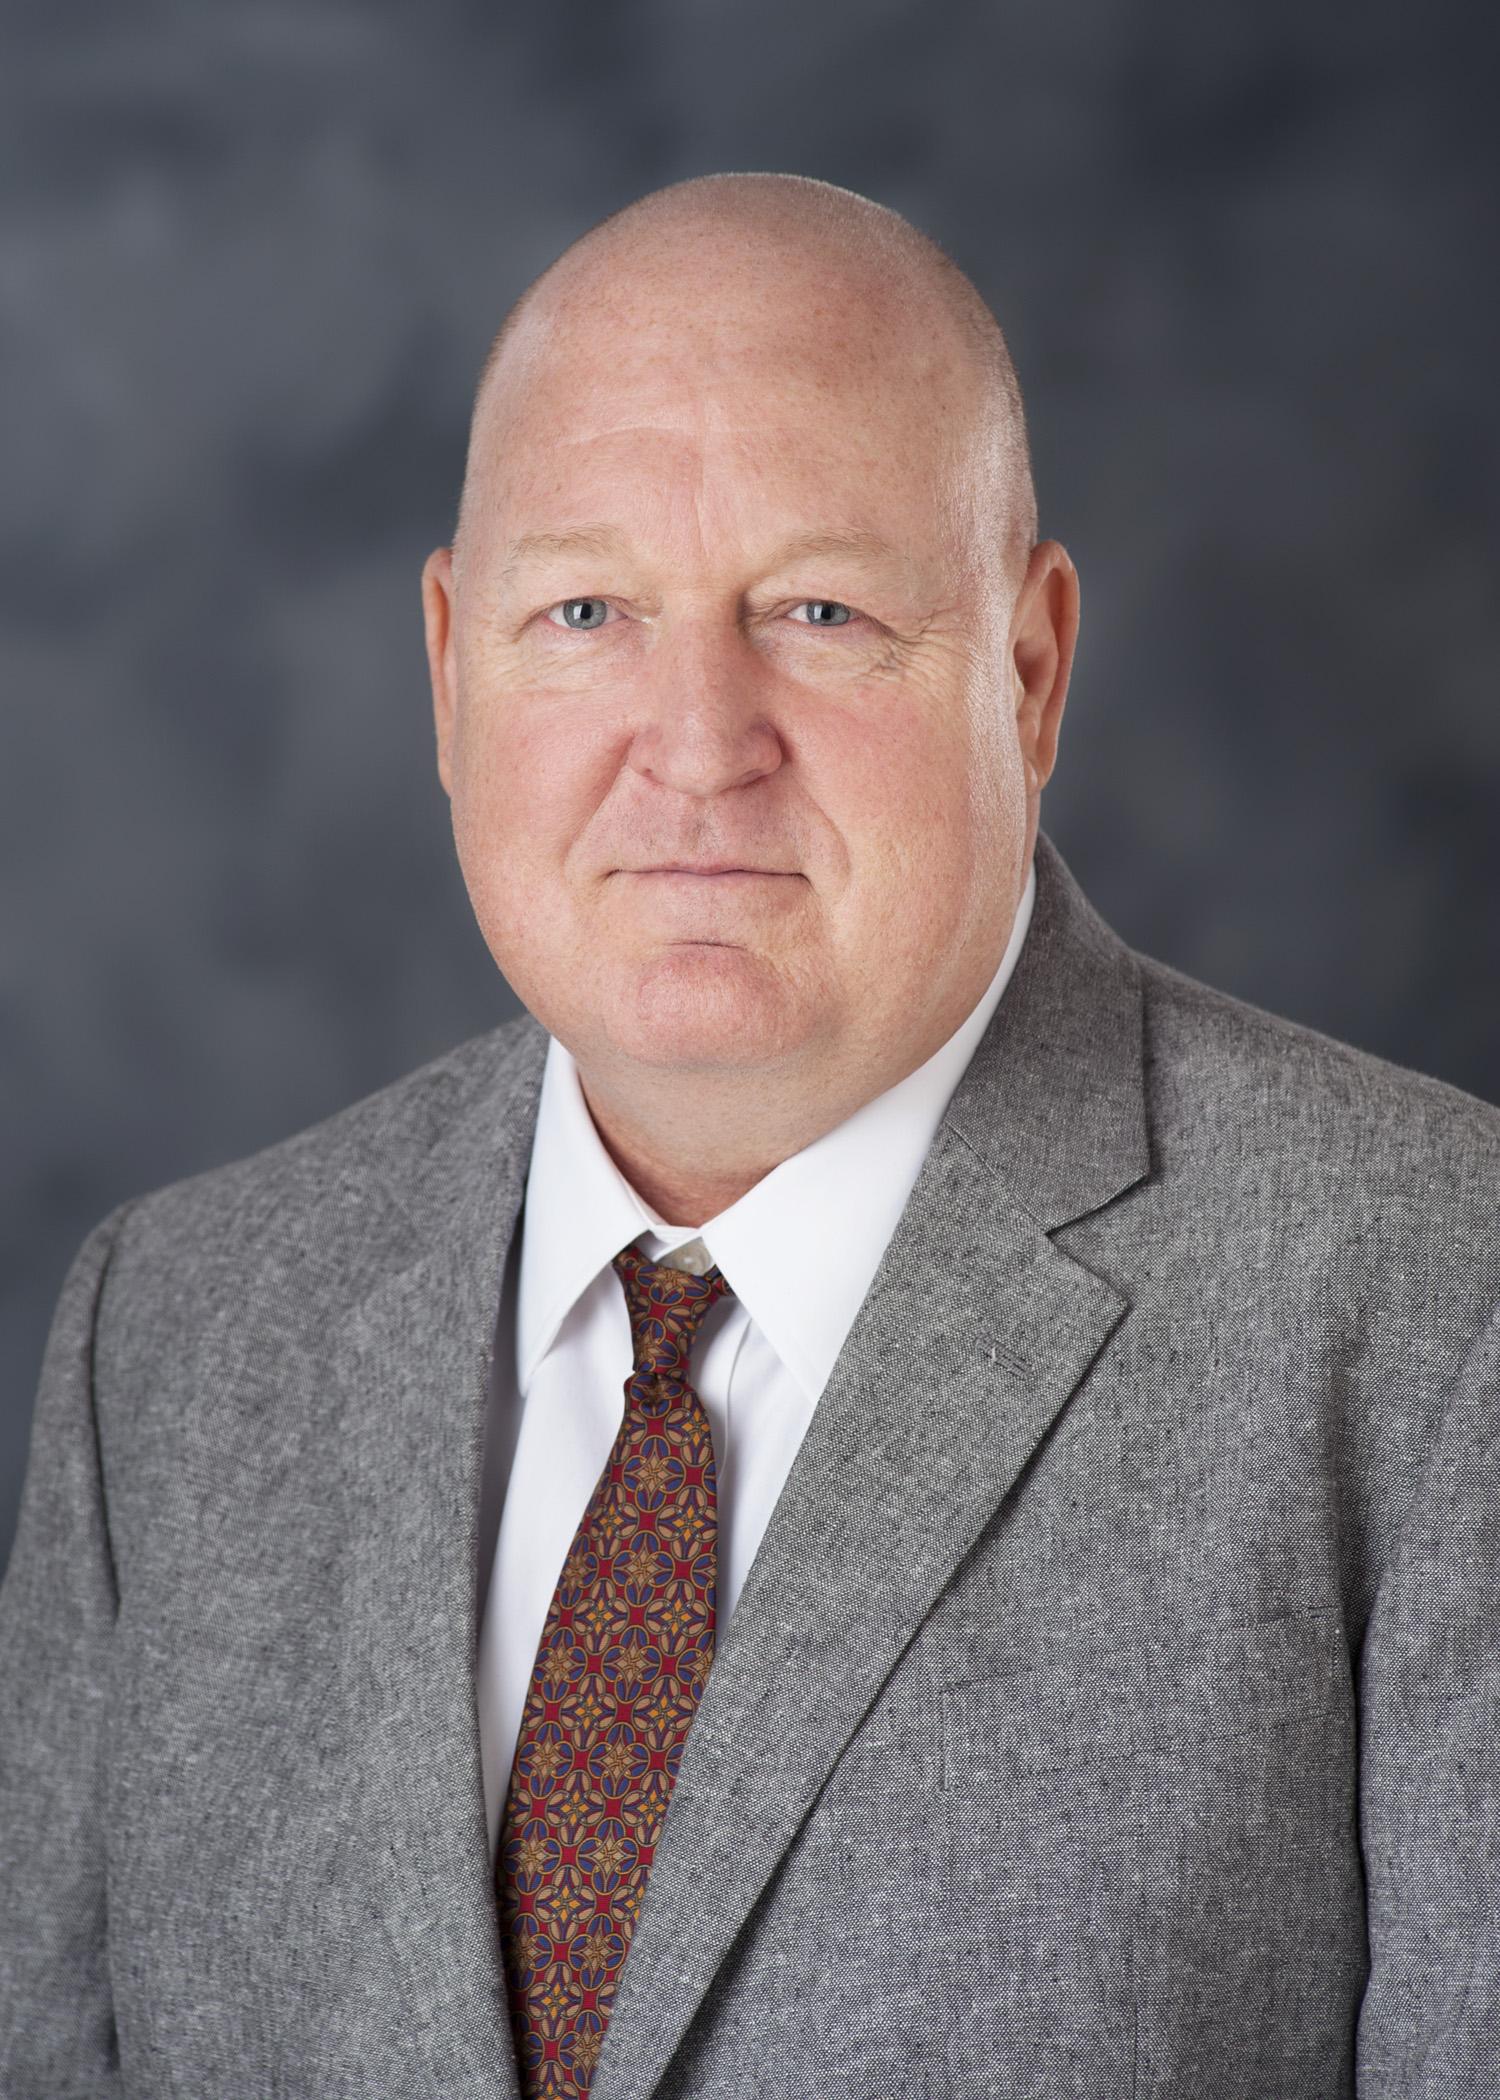 Jeffrey Haupt